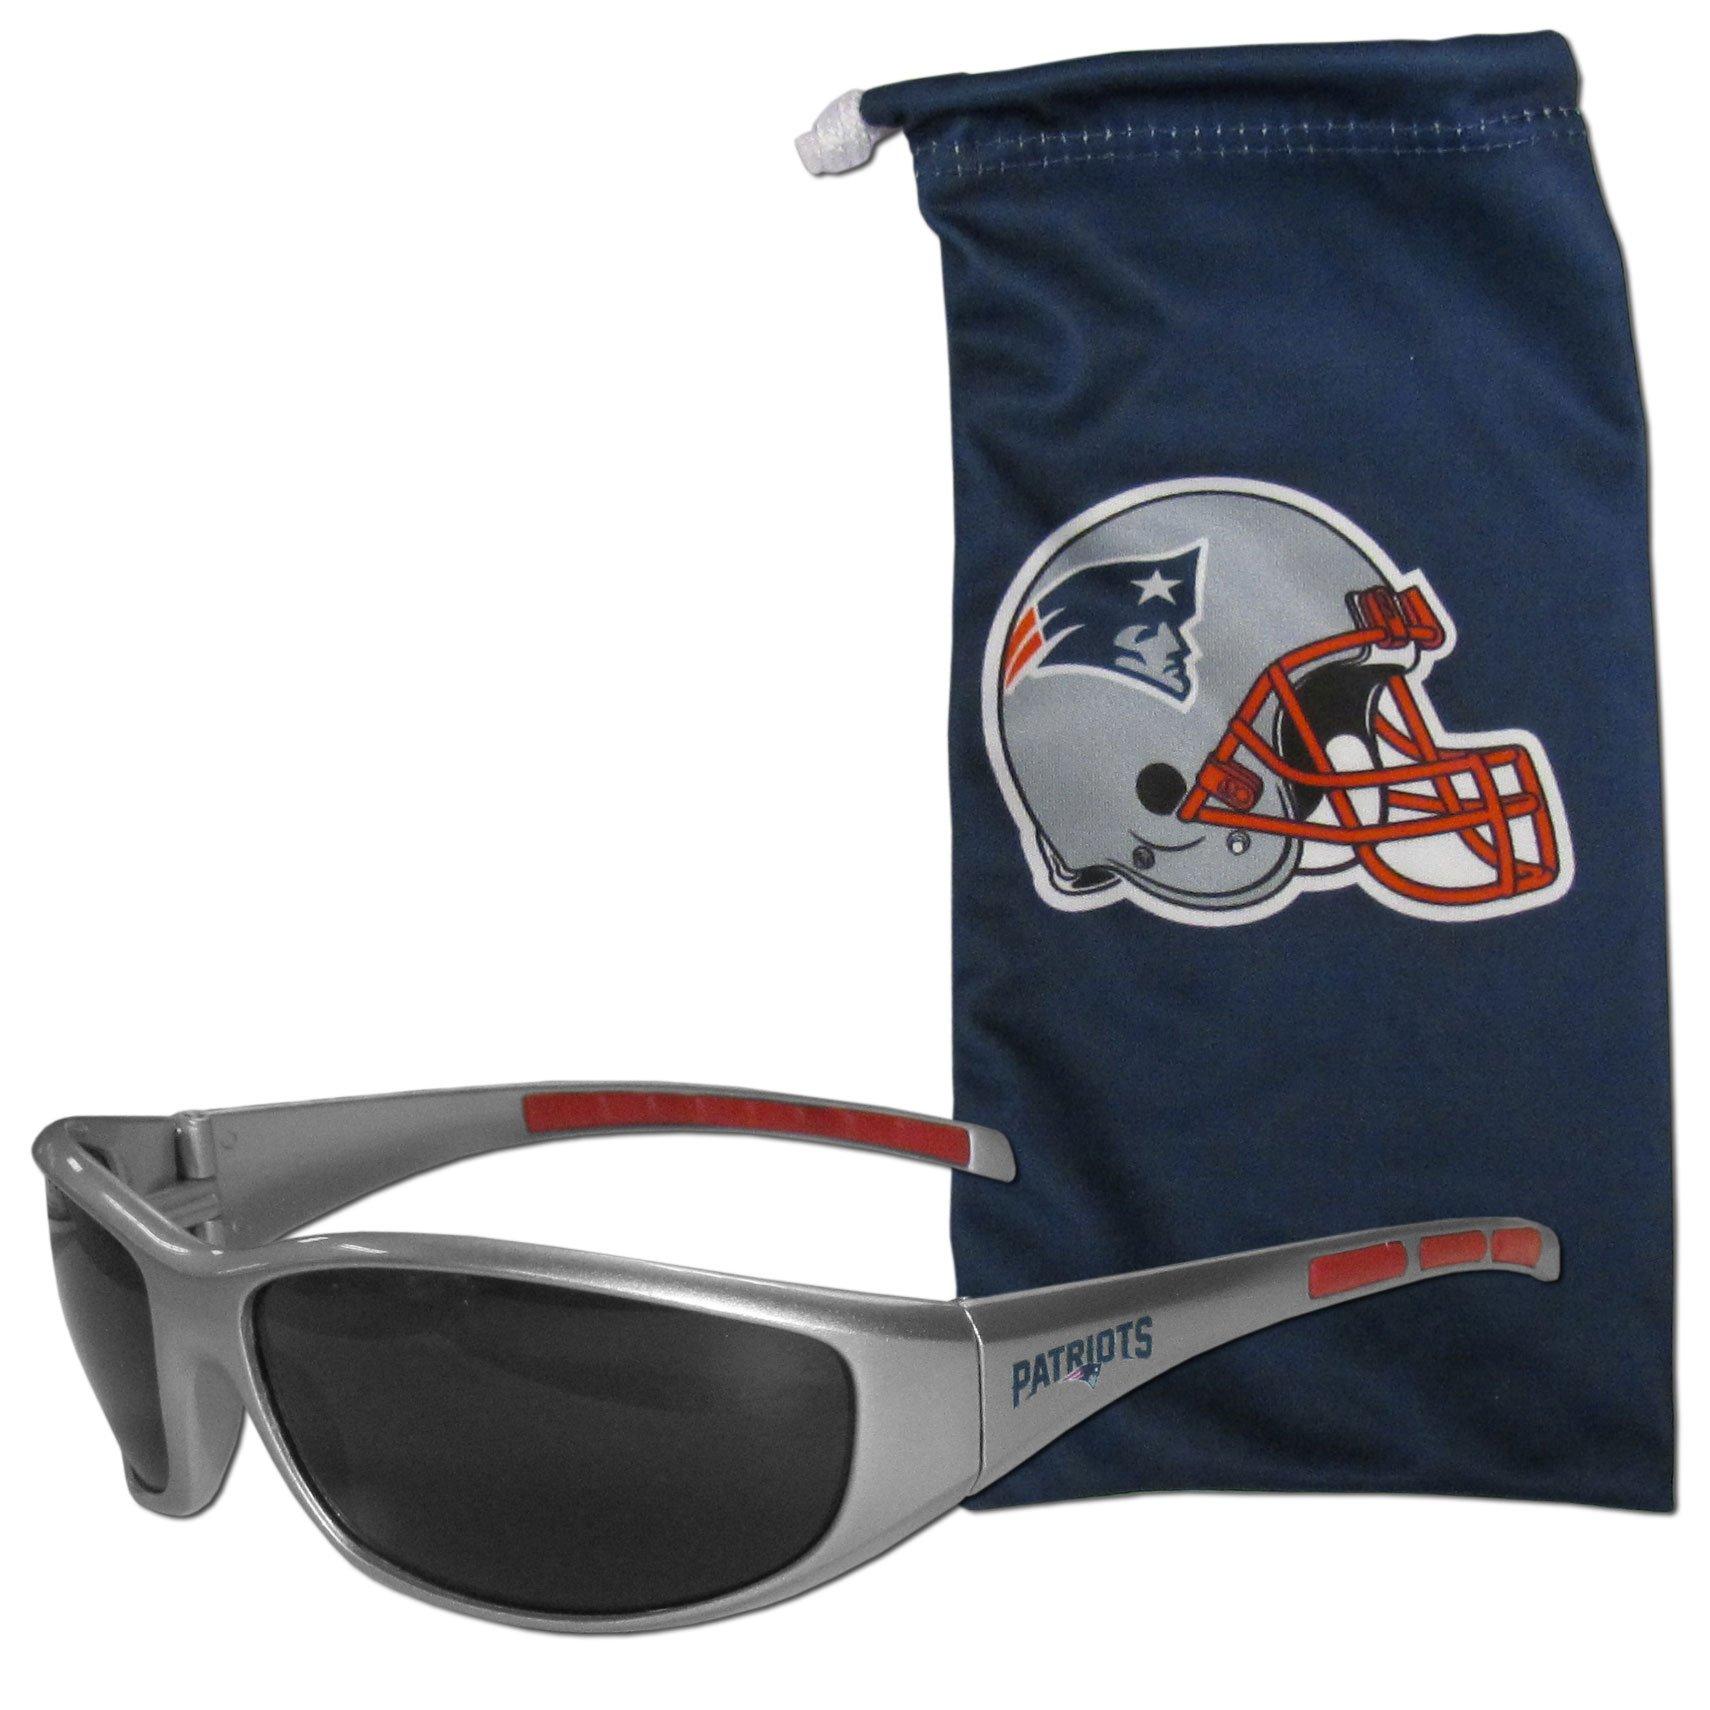 NFL New England Patriots Adult Sunglass and Bag Set, Blue